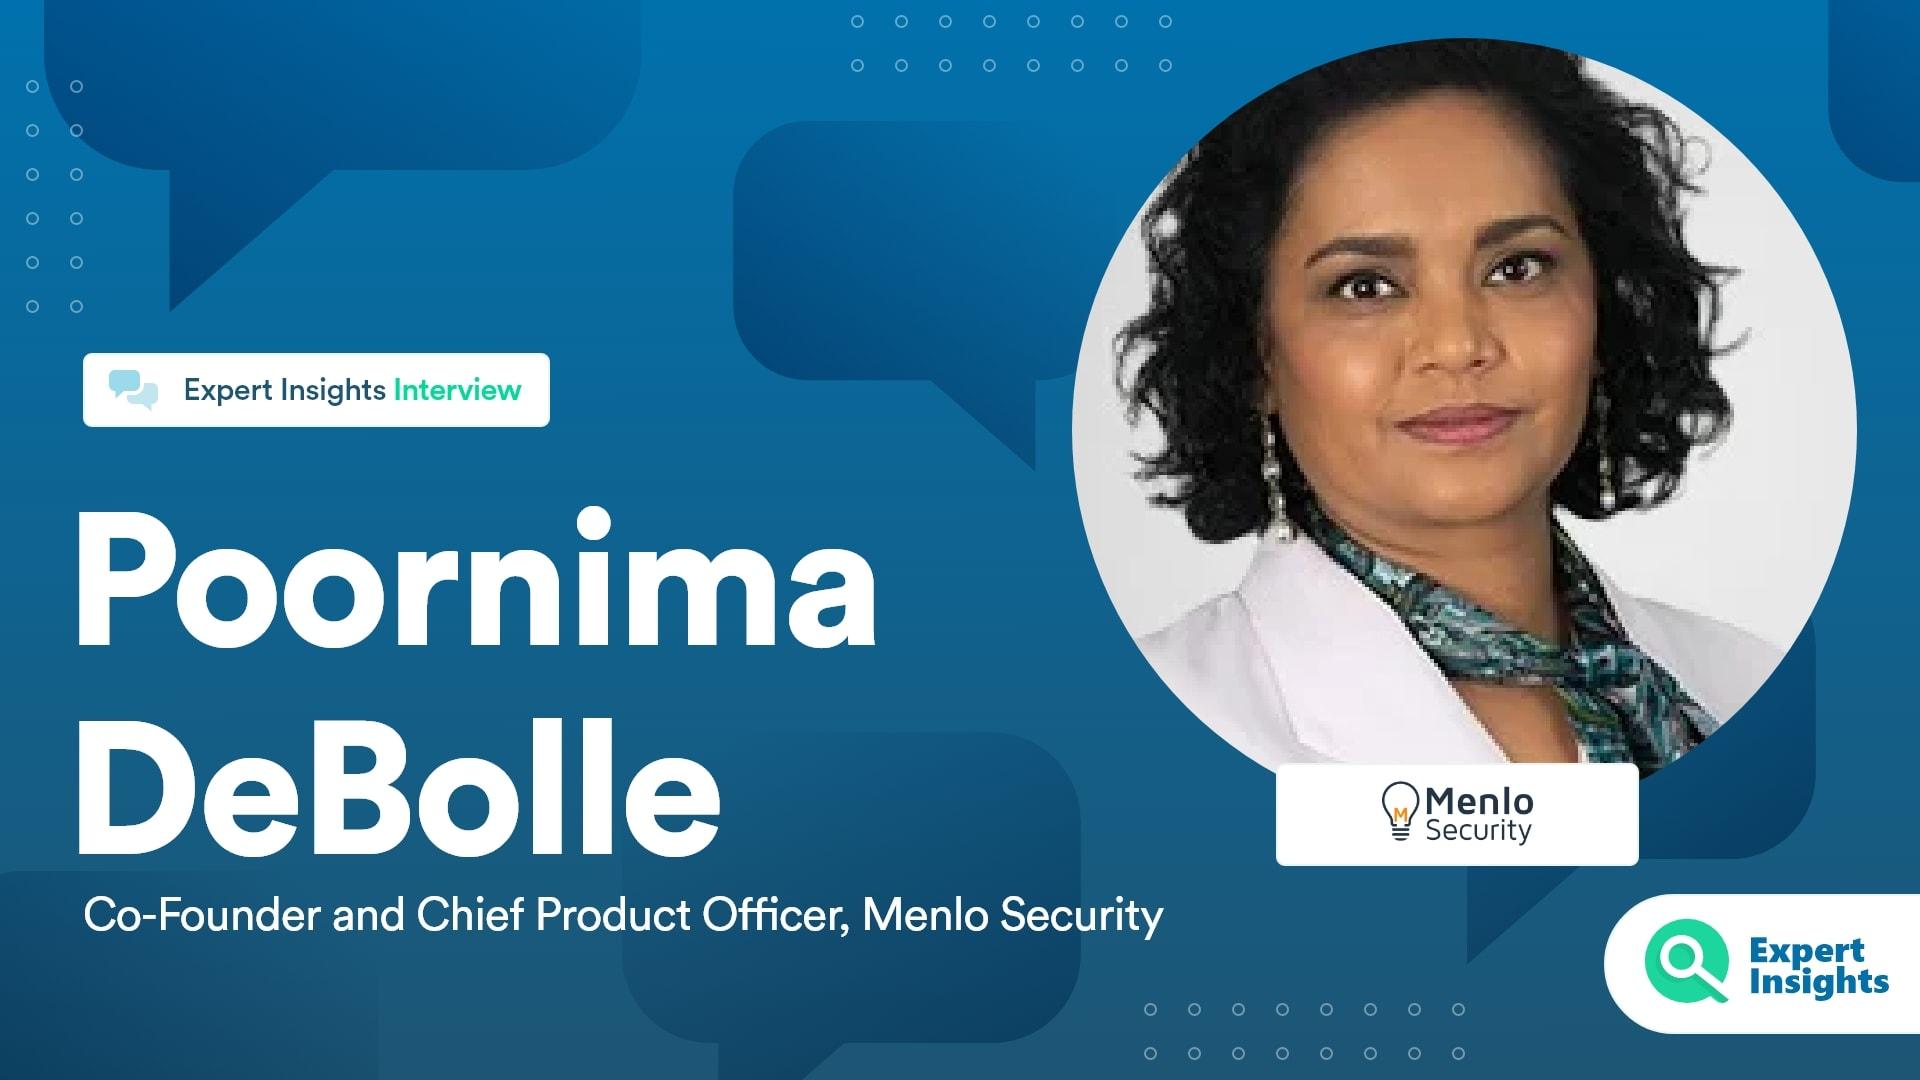 Expert Insights Interview With Poornima DeBolle Of Menlo